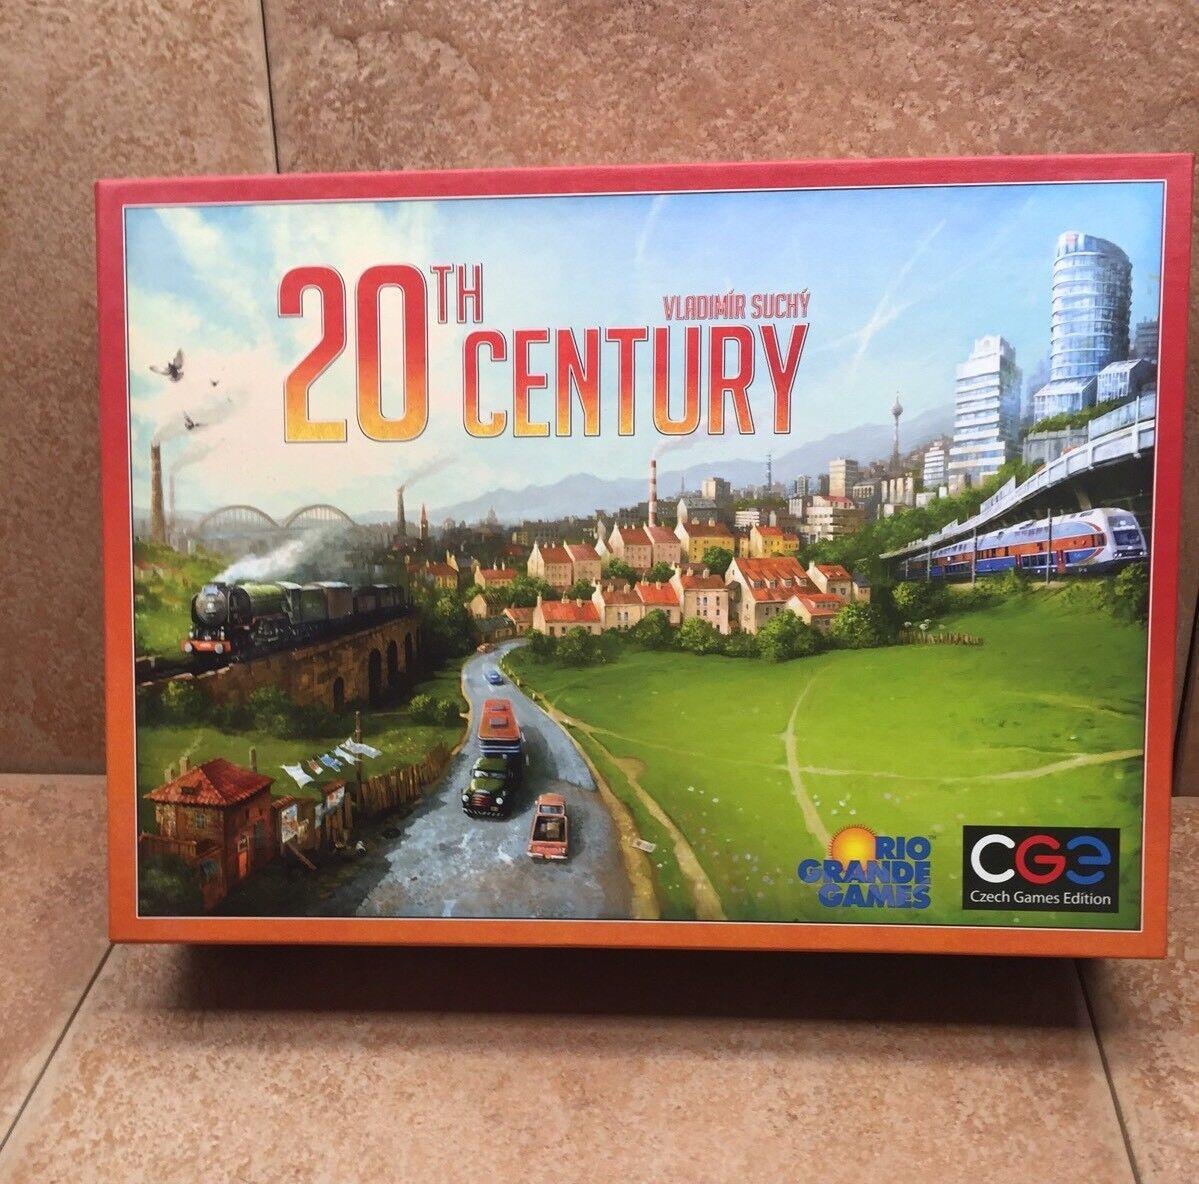 20Th Century Board Game by Vladimir Suchy Rio Grande Games